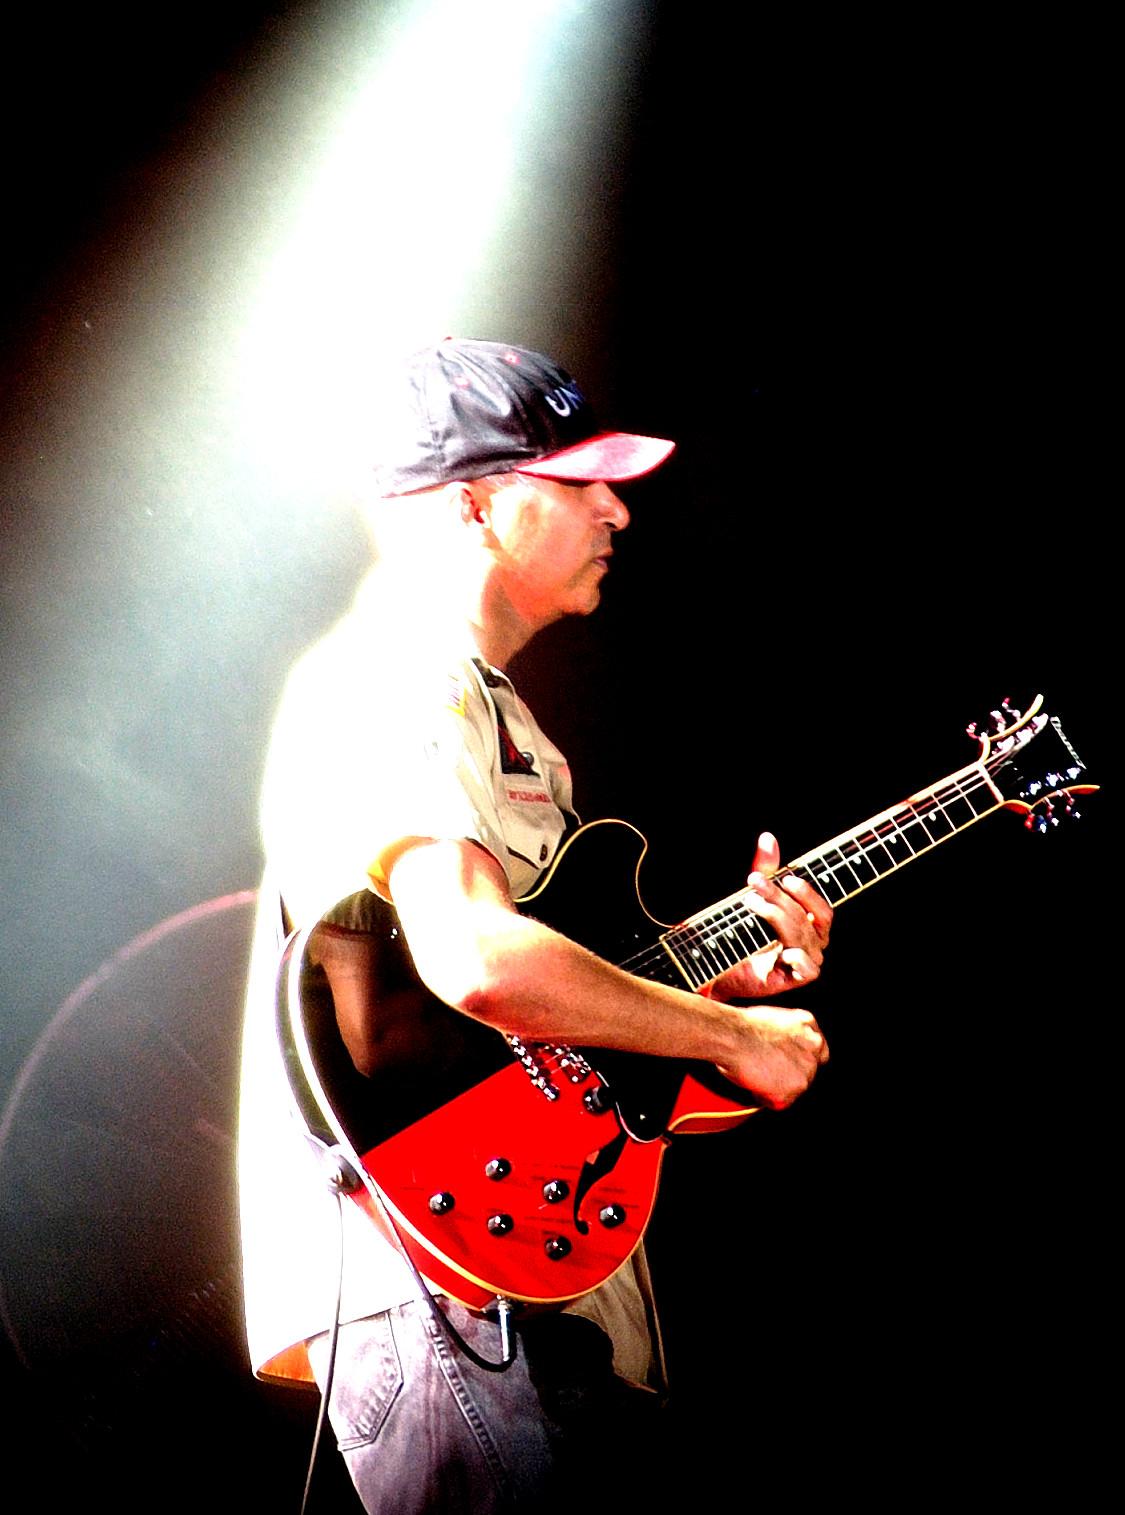 Tom Morello Black and Red